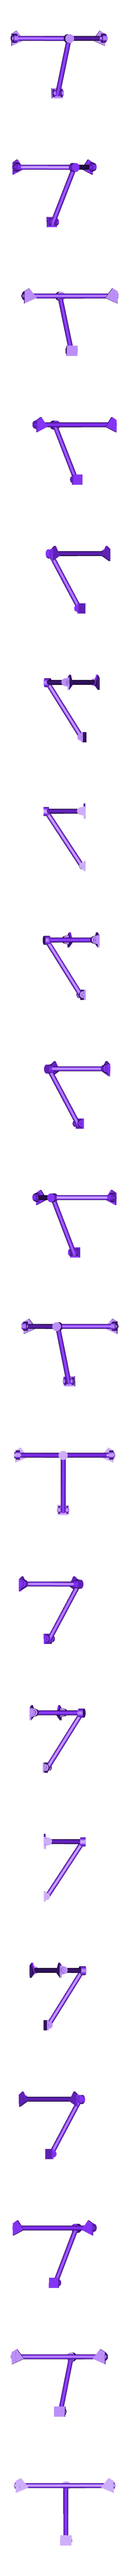 triangle_brace.stl Download free STL file Apollo F1 Rocket Engine on Stand • 3D print object, monsenrm